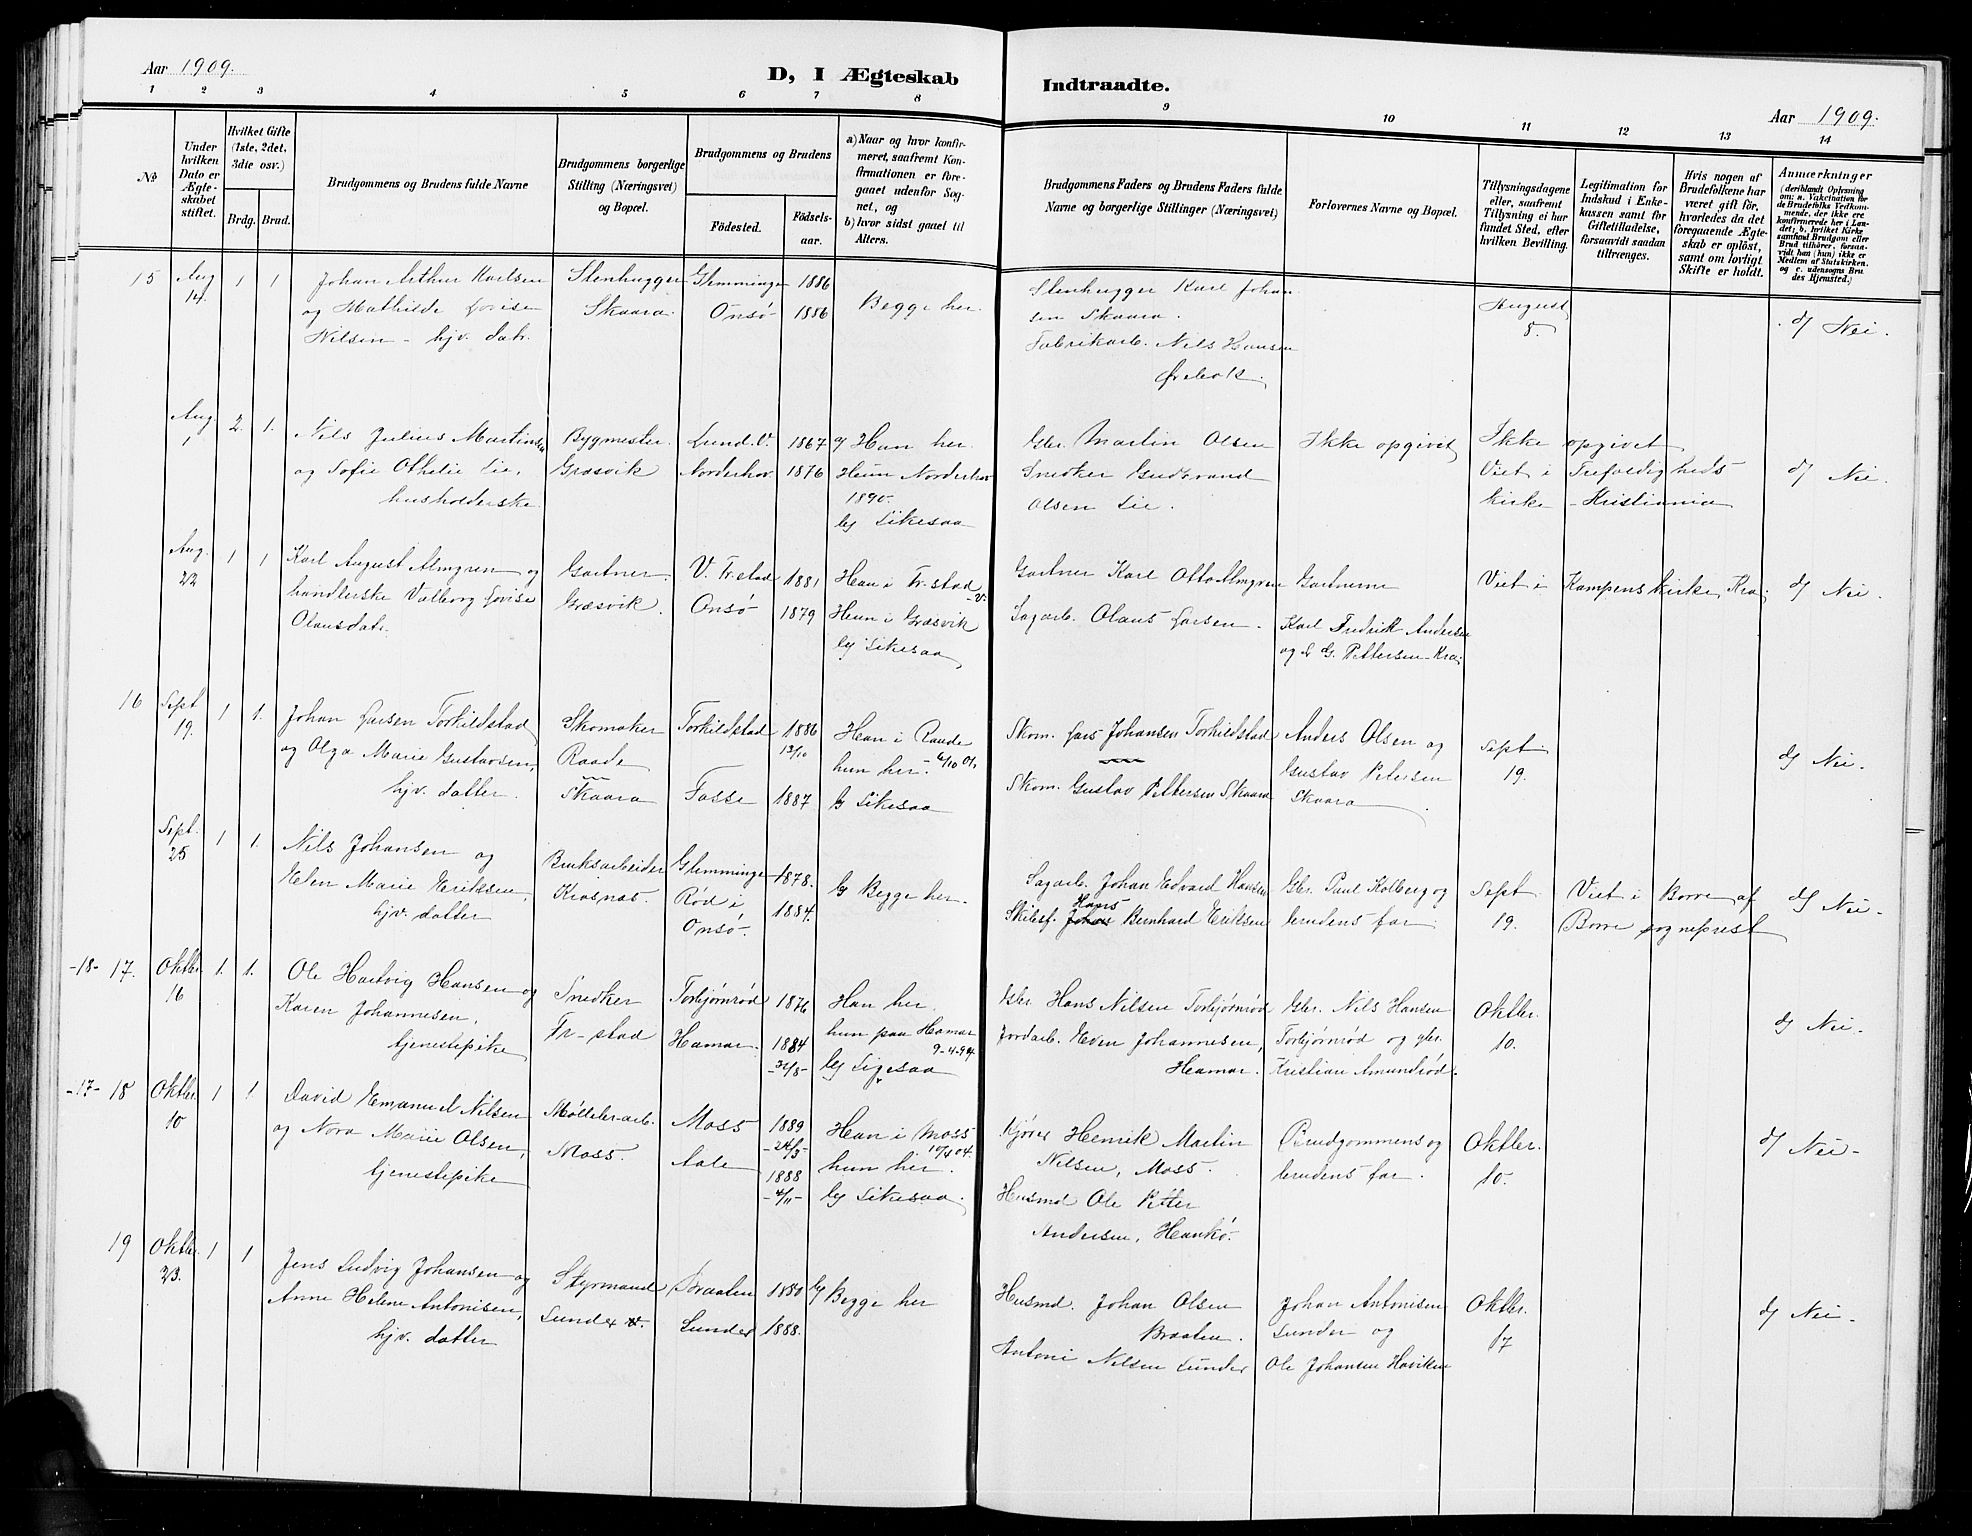 SAO, Onsøy prestekontor Kirkebøker, G/Ga/L0002: Klokkerbok nr. I 2, 1903-1909